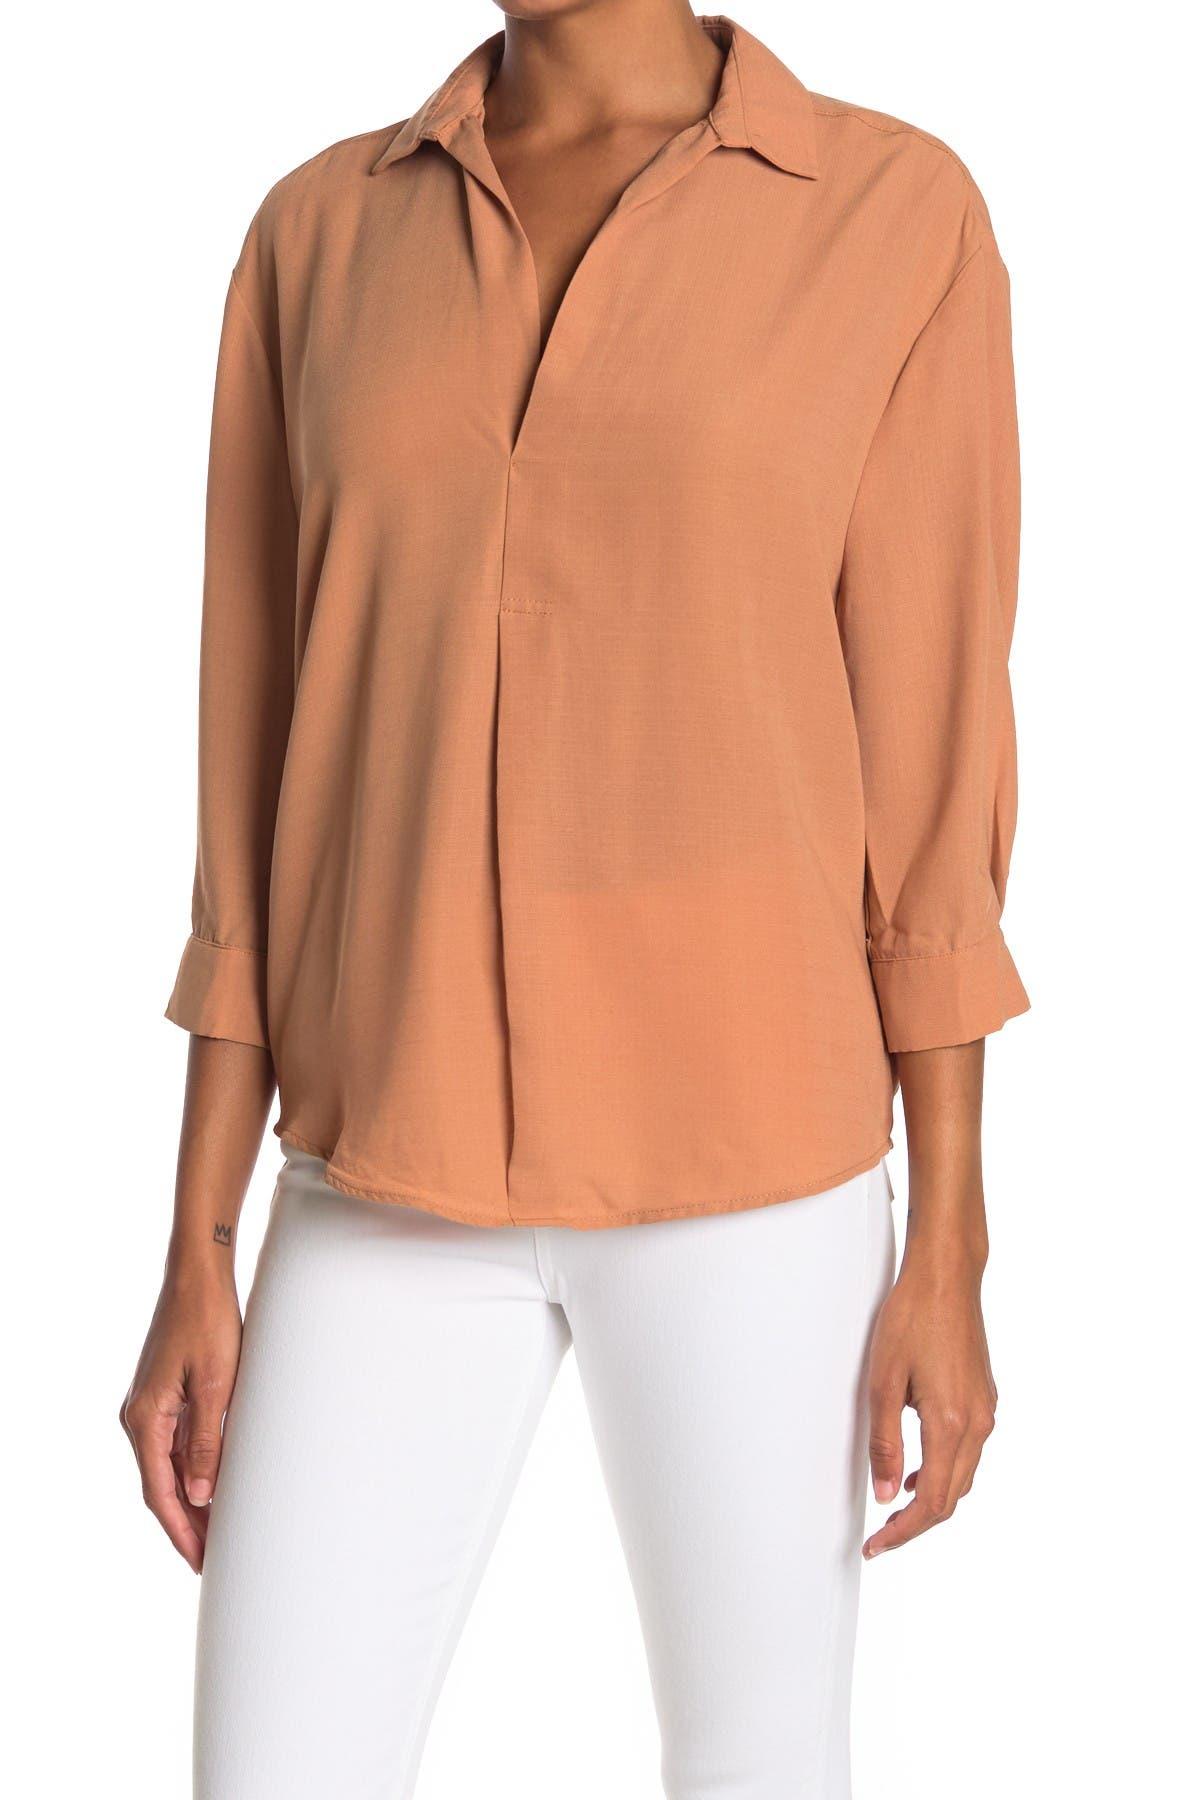 Image of HYFVE Front Pleat Shirt